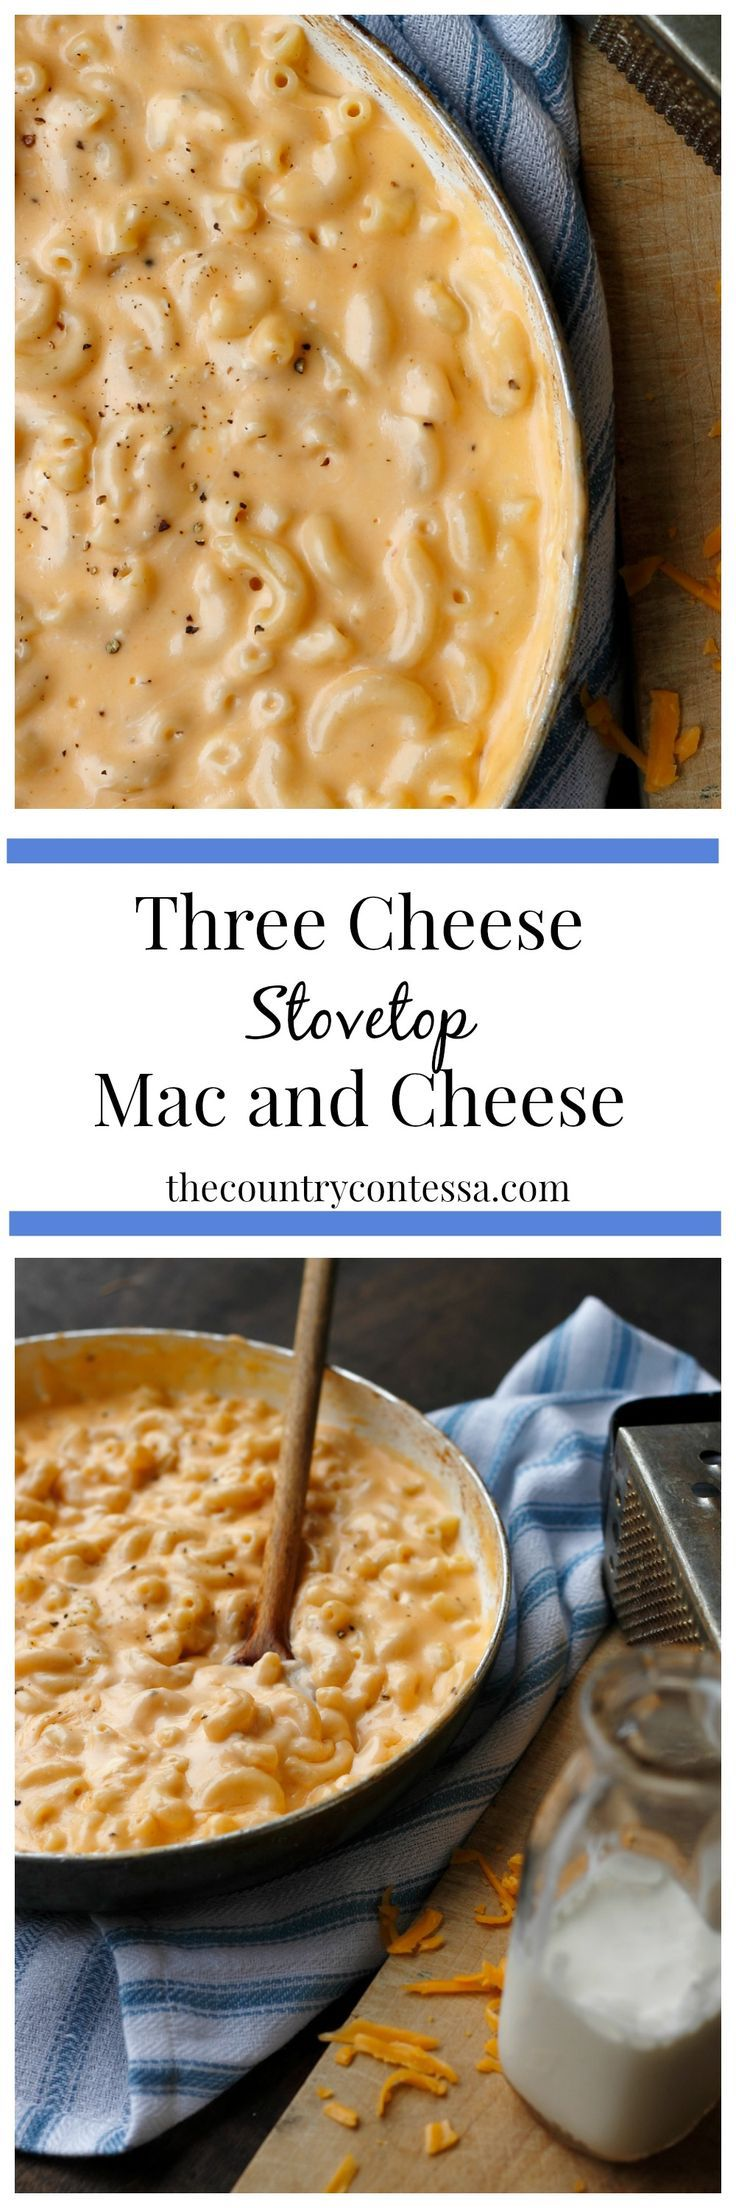 Image from https://i.pinimg.com/736x/ed/b7/6a/edb76ac8243b4311c5e63bb94a50a35e--stovetop-mac-and-cheese-mac-cheese.jpg.